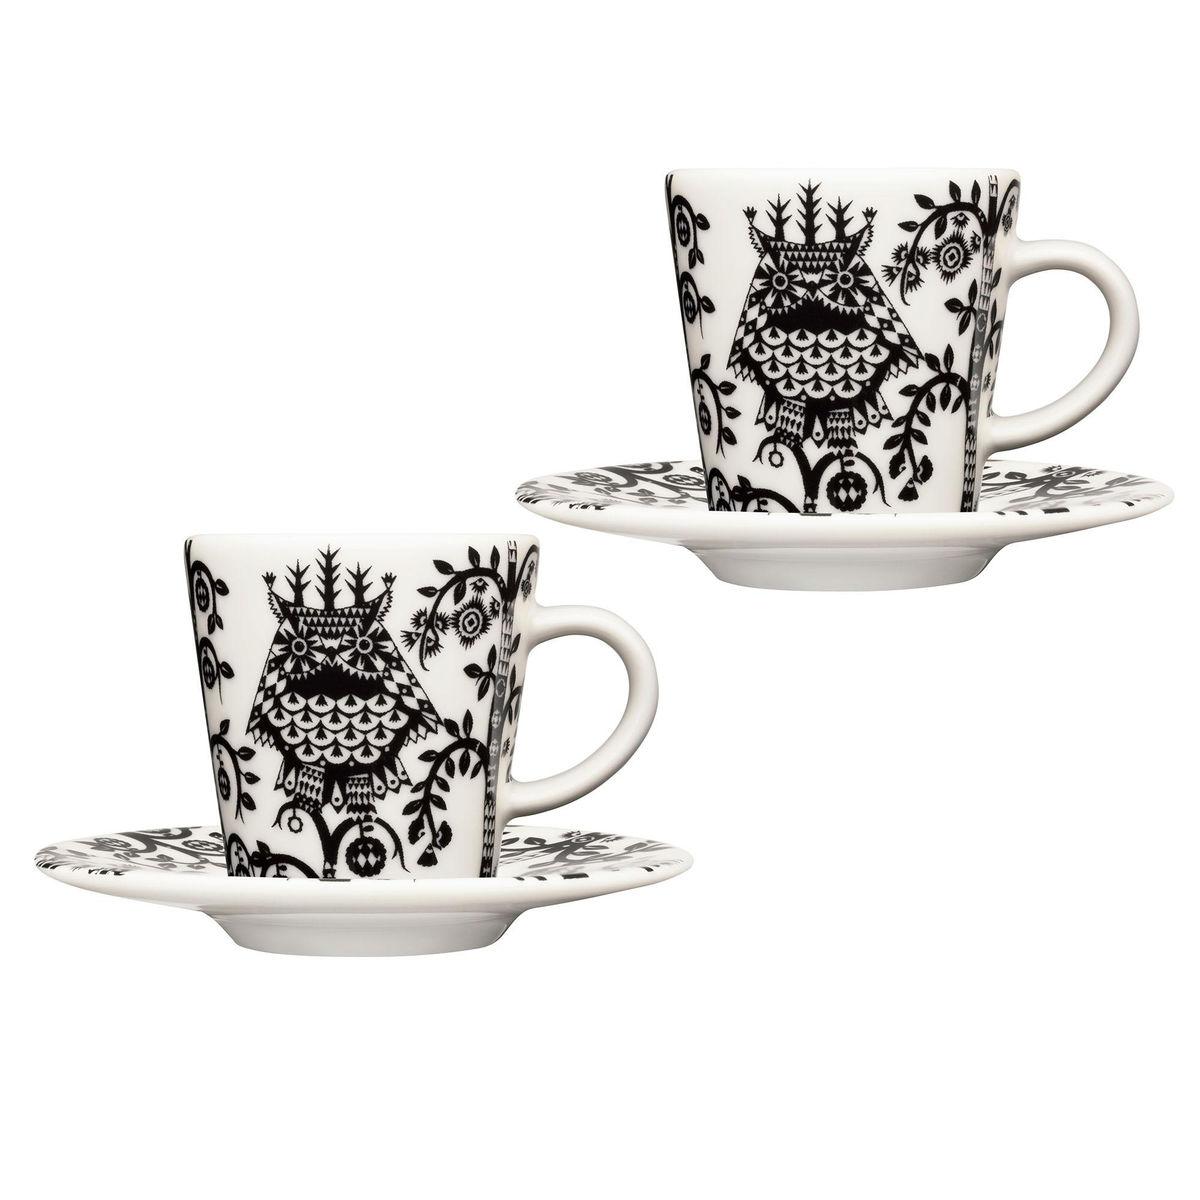 Taika set de 2 tazas de caf espresso iittala for Tazas para cafe espresso